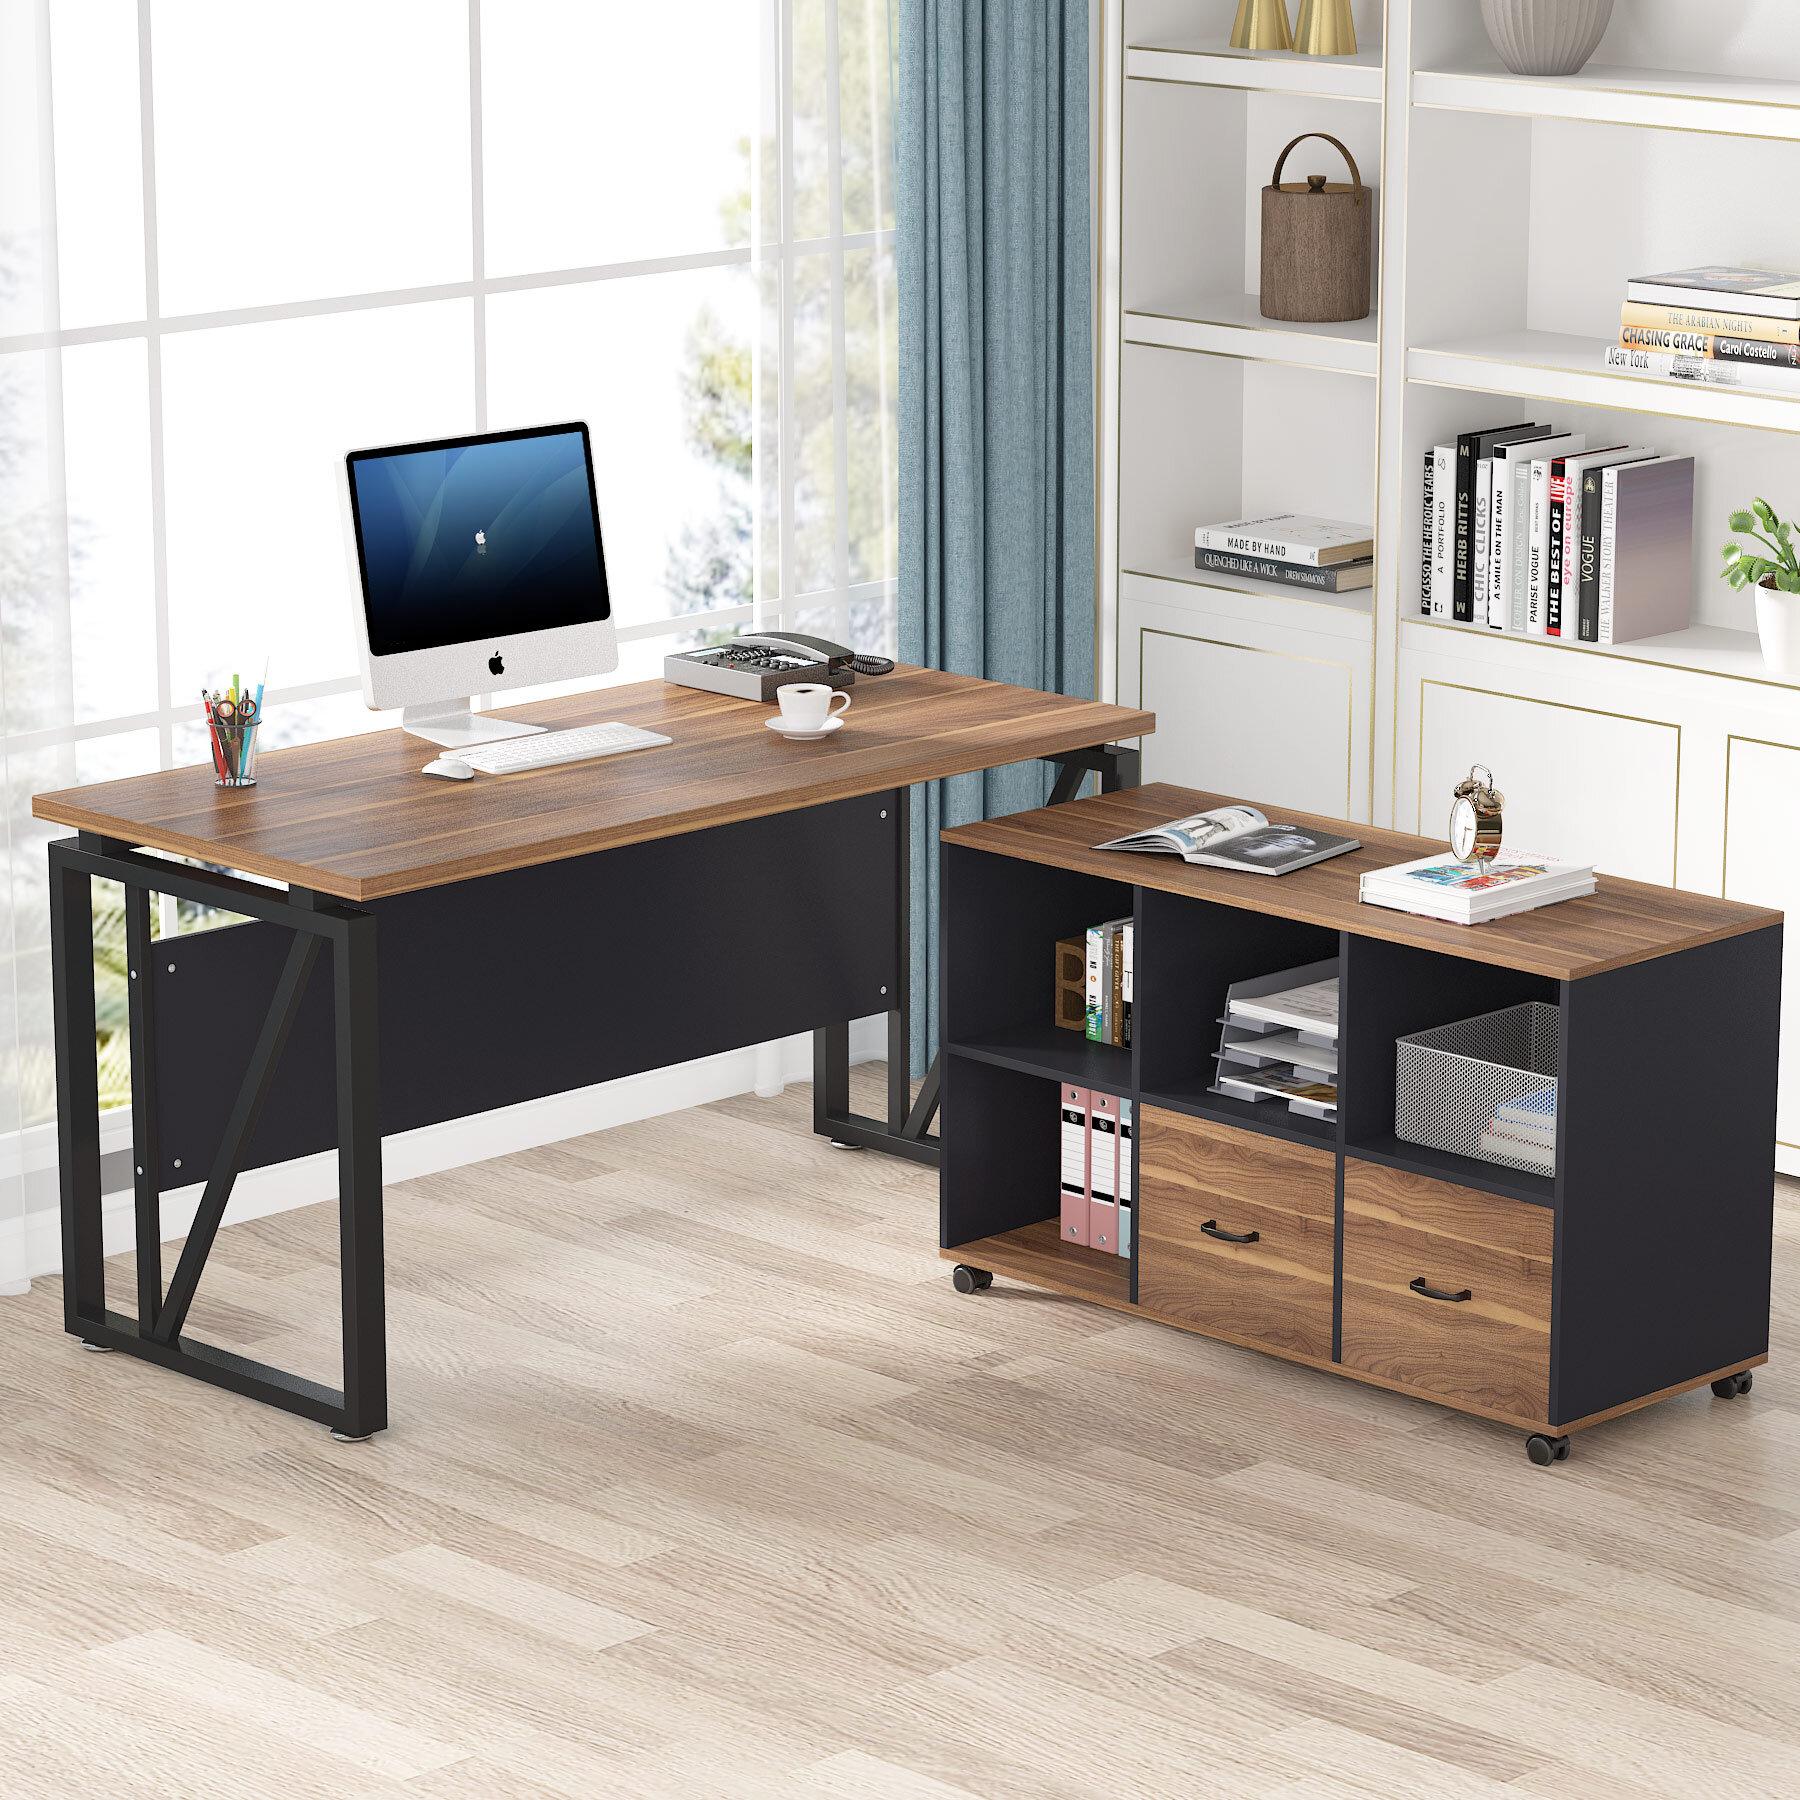 Bookcase Credenza Desks You Ll Love In 2021 Wayfair